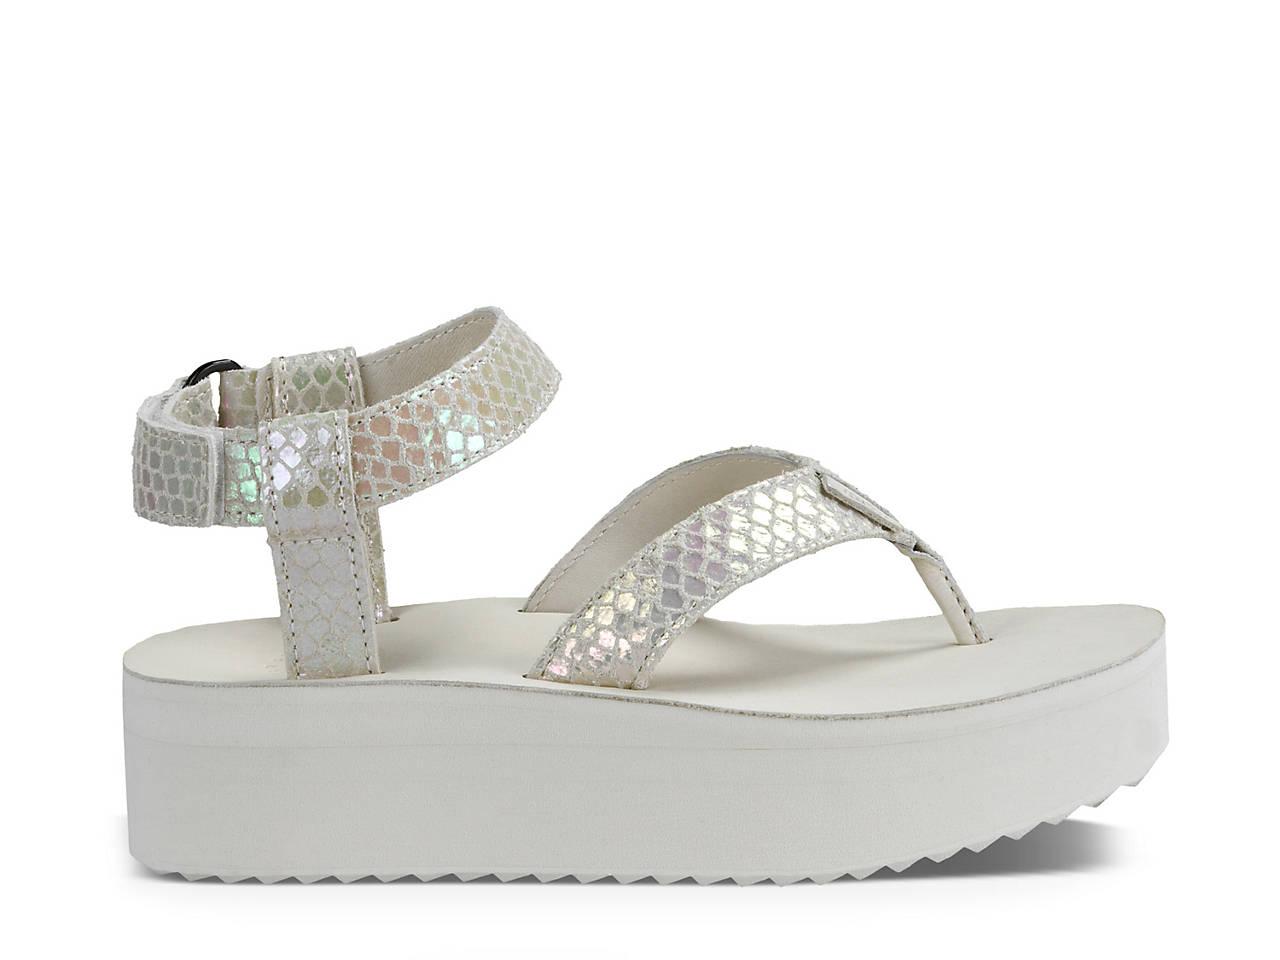 2ab83d524e4 Teva Flatform Universal Iridescent Sandal Women s Shoes